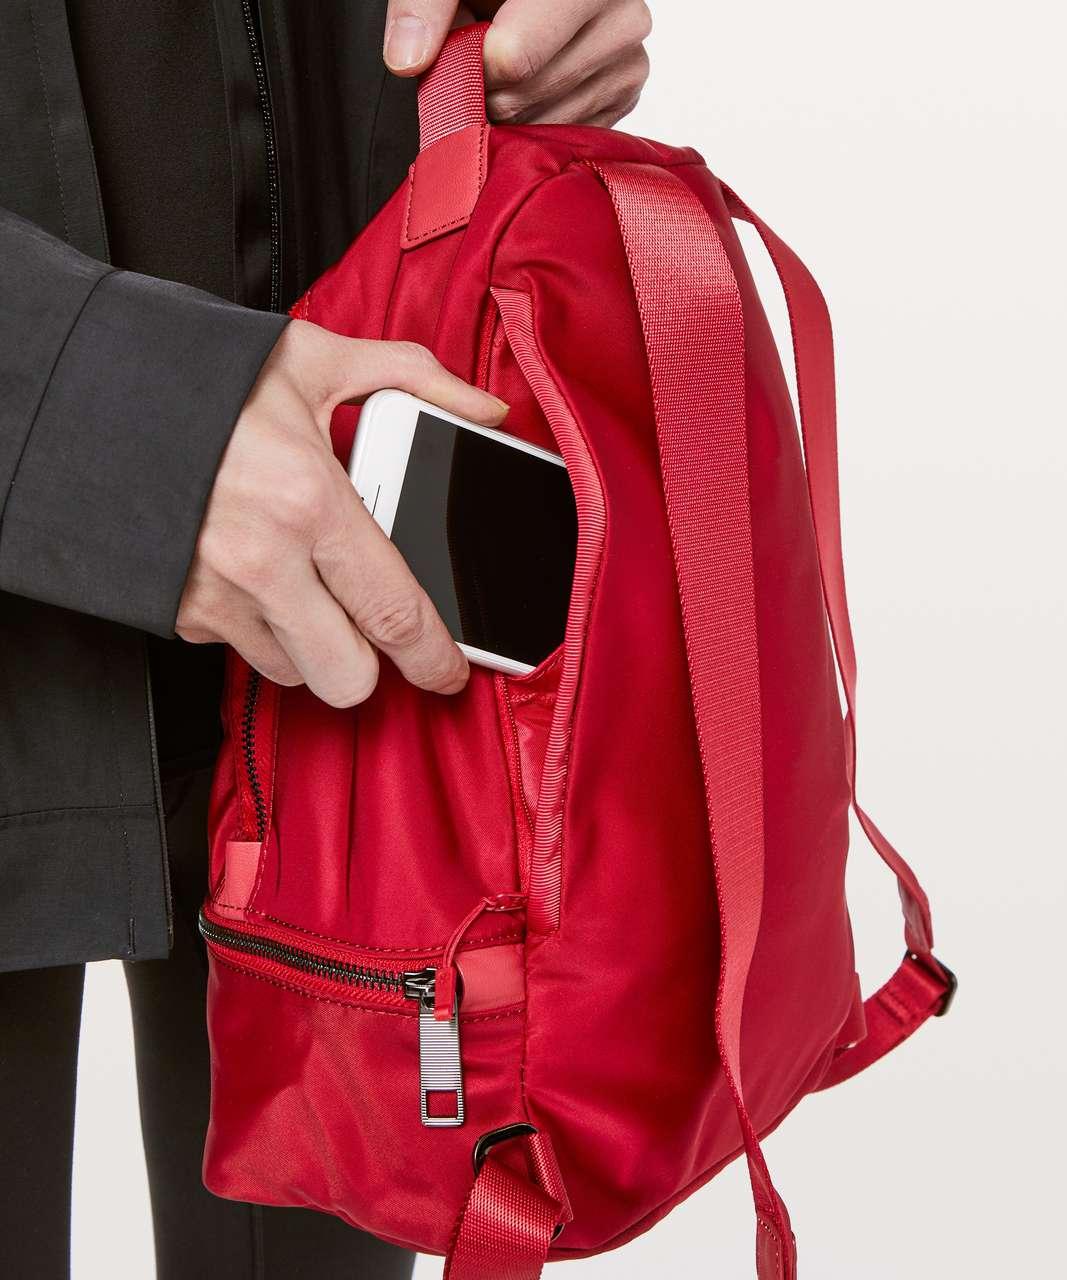 Lululemon City Adventurer Backpack Mini II *10L - Dark Red